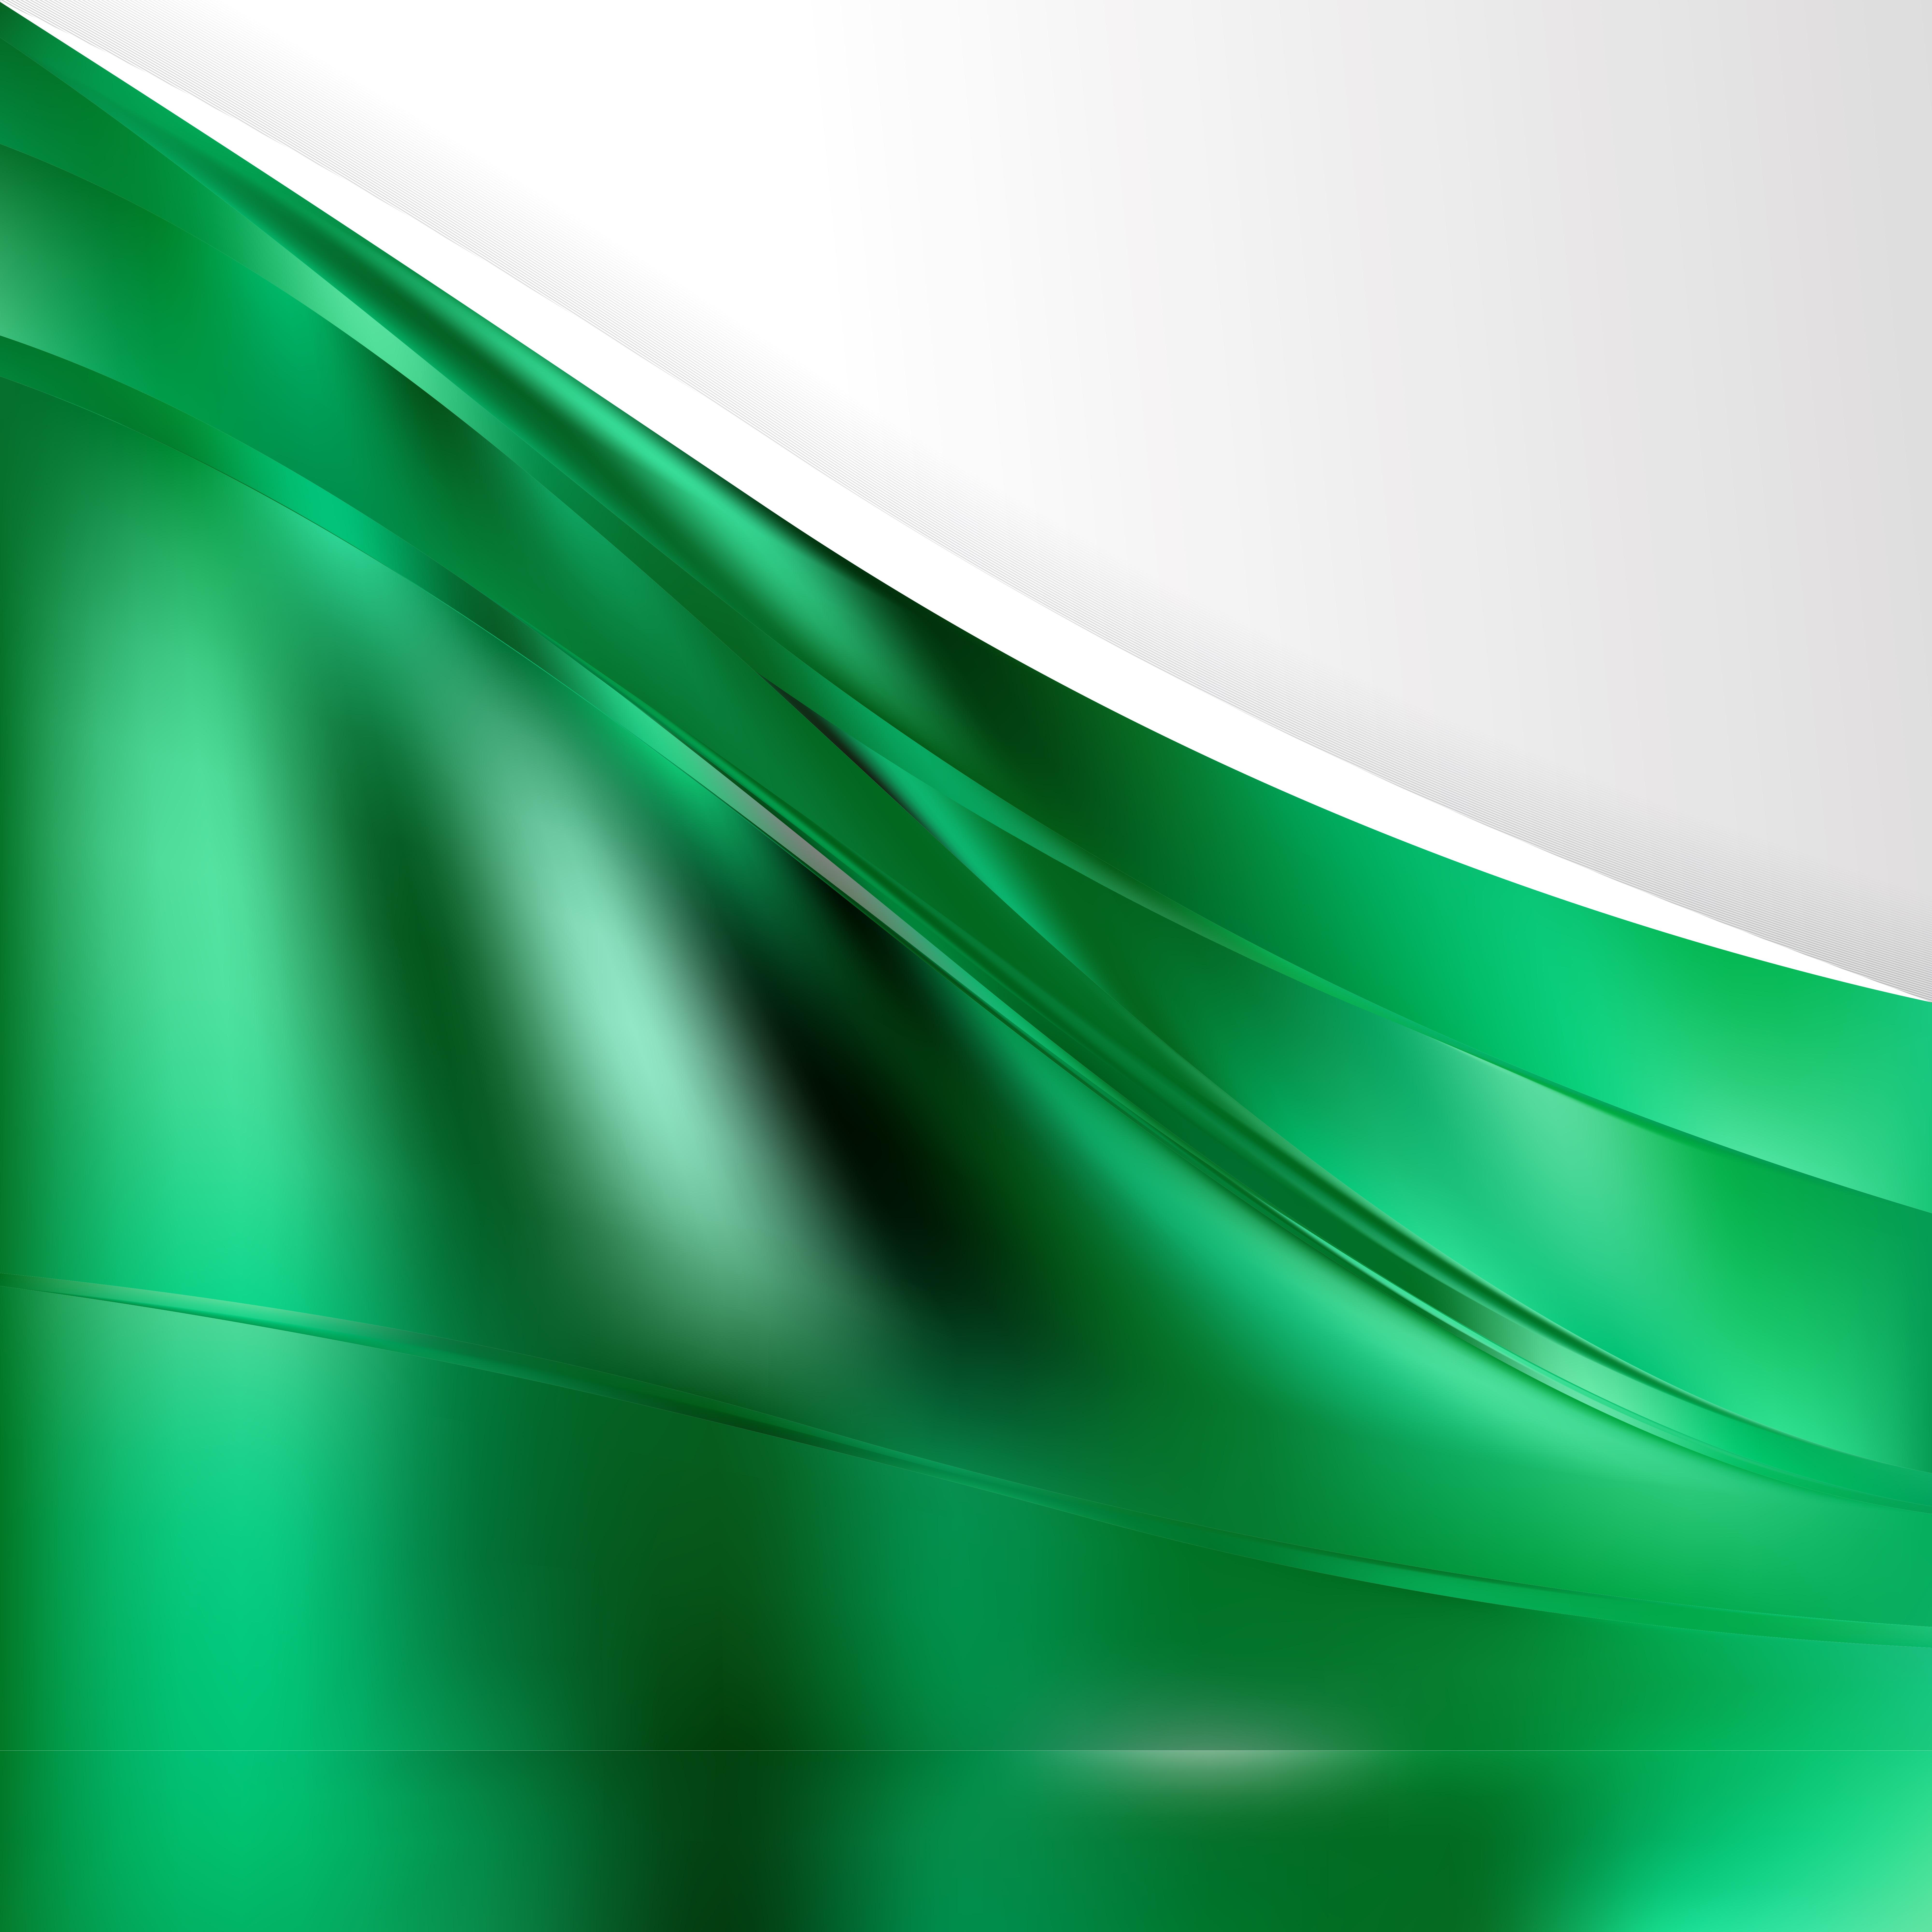 Emerald Green Background Template 8000x8000